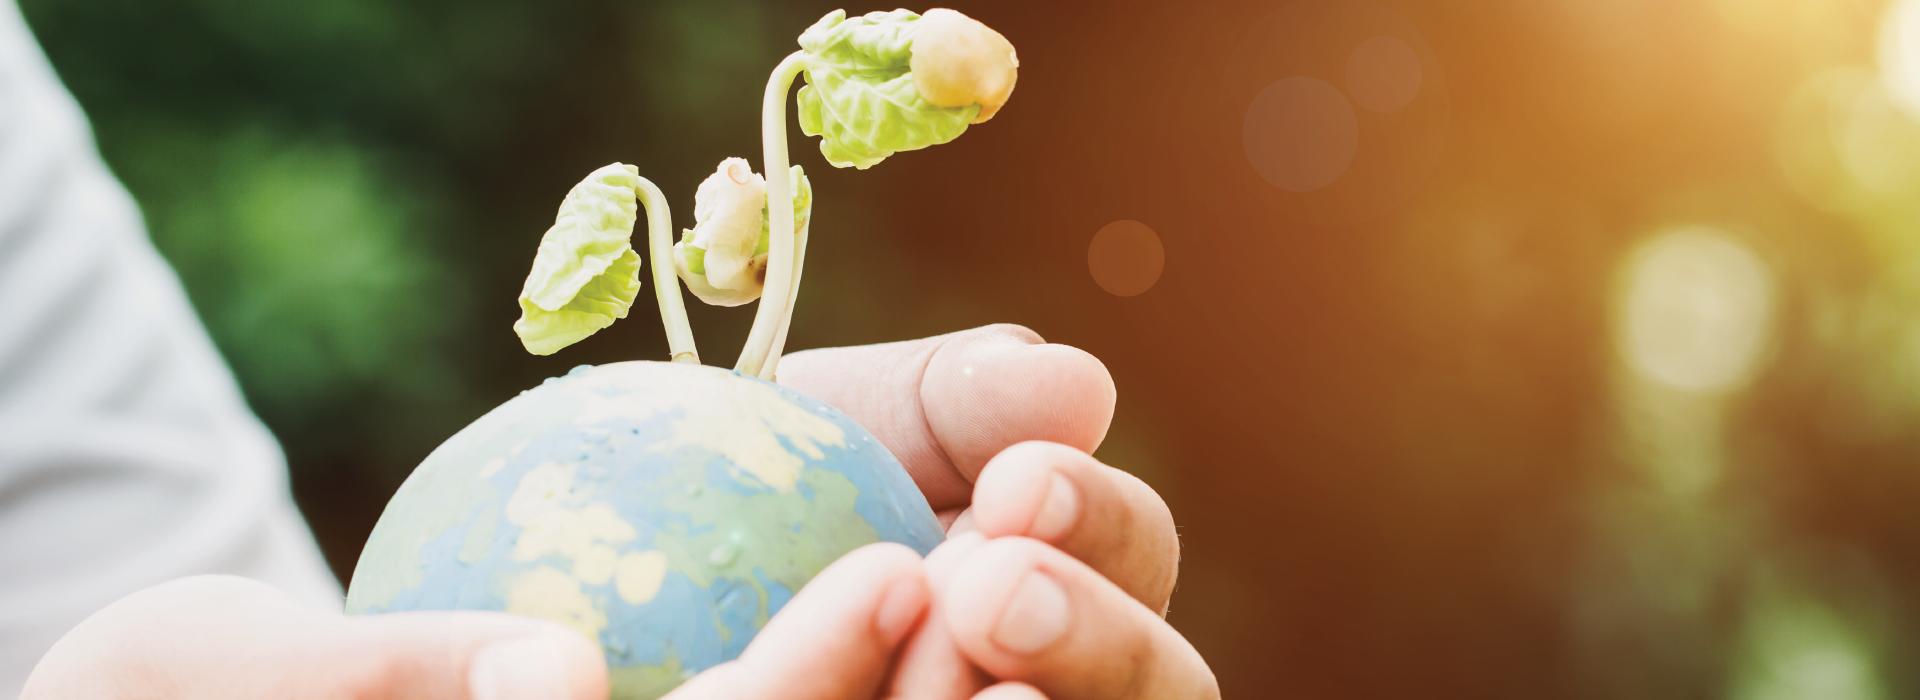 ziua-internationala-a-mediului-dezvoltare-durabila-dezvoltare-sustenabila-sustenabilitate-natura-reciclare-blog-royal-synergy